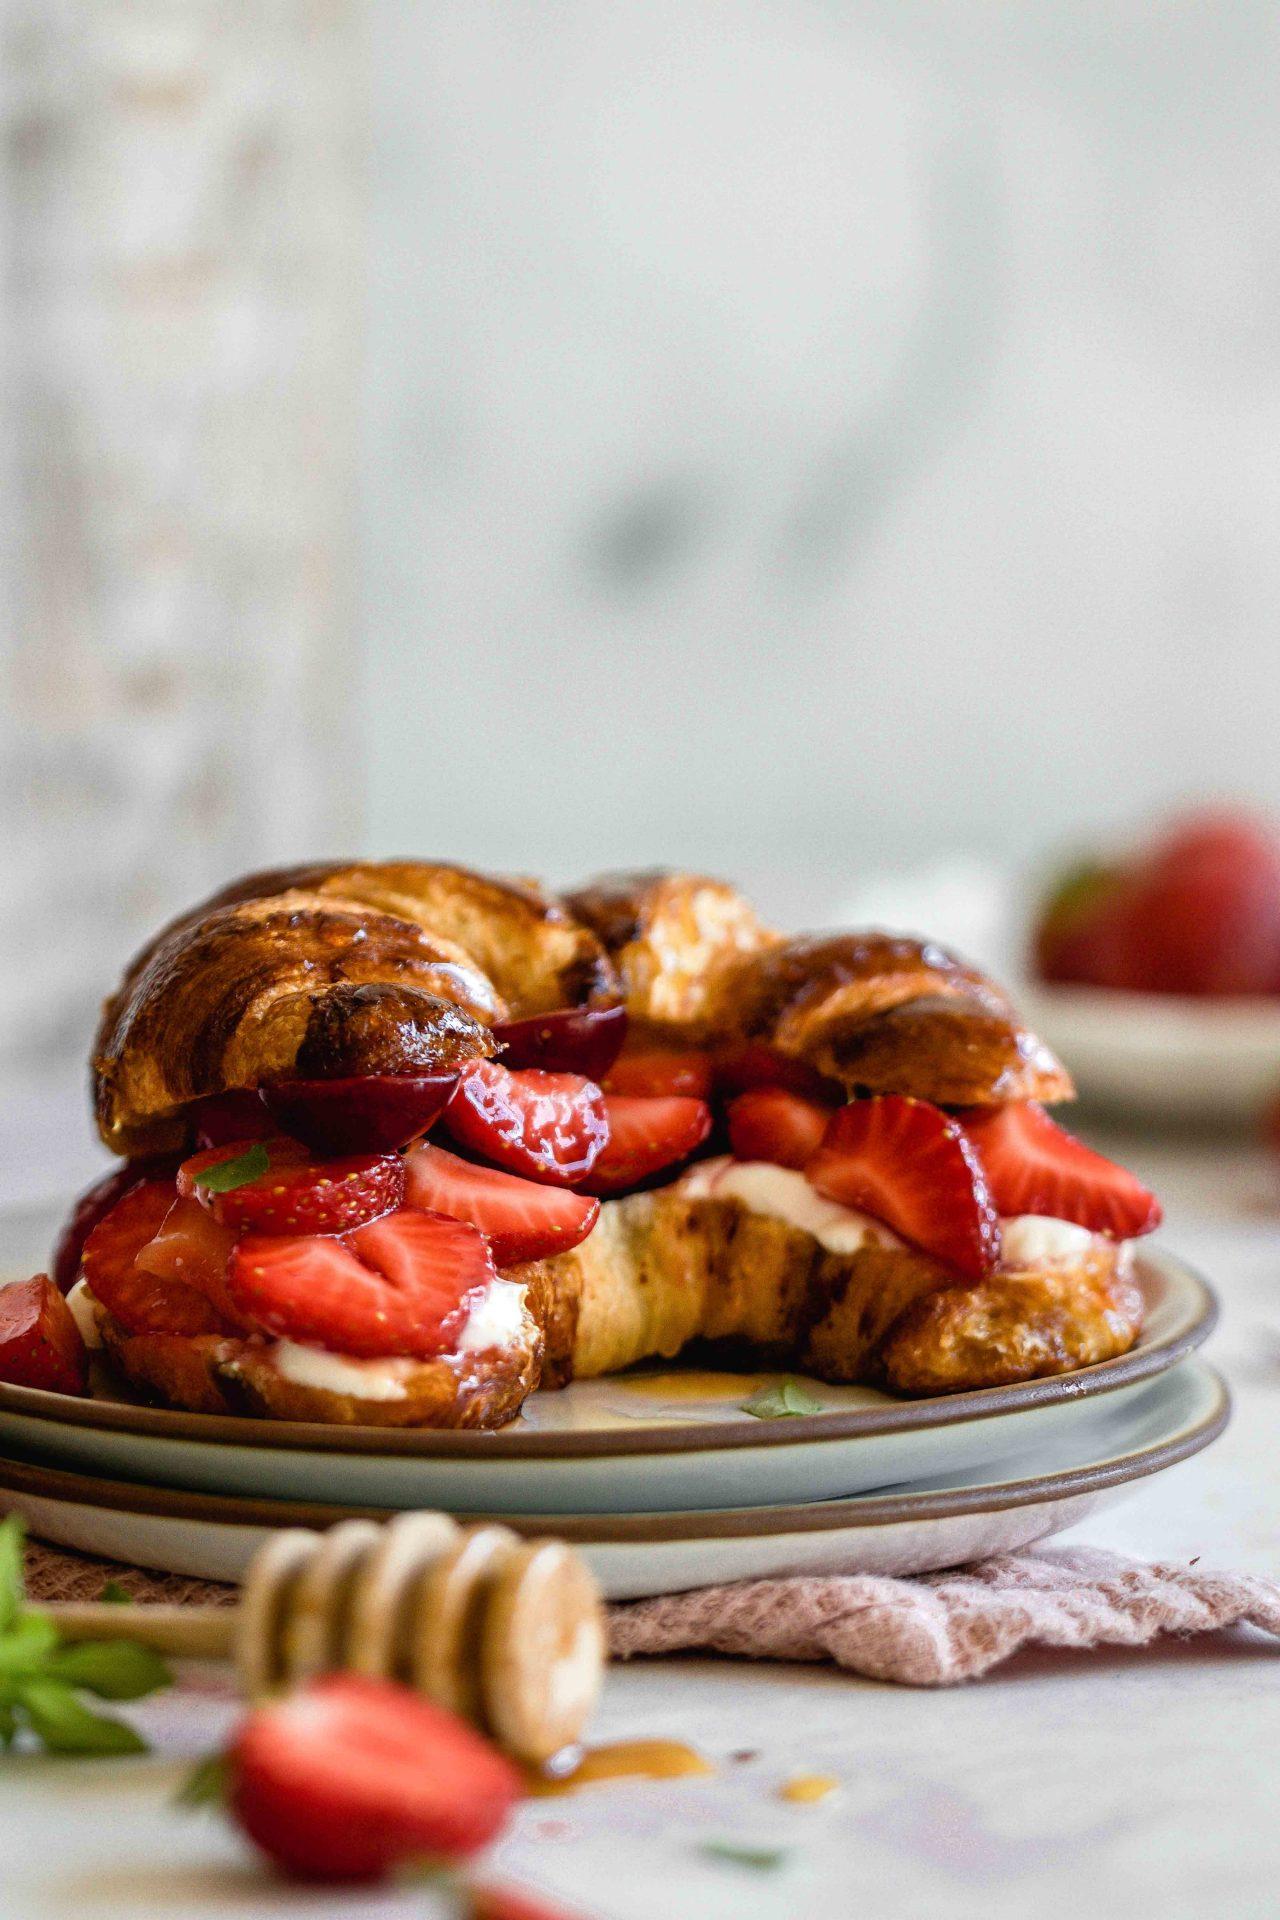 Prezel croissant with strawberries